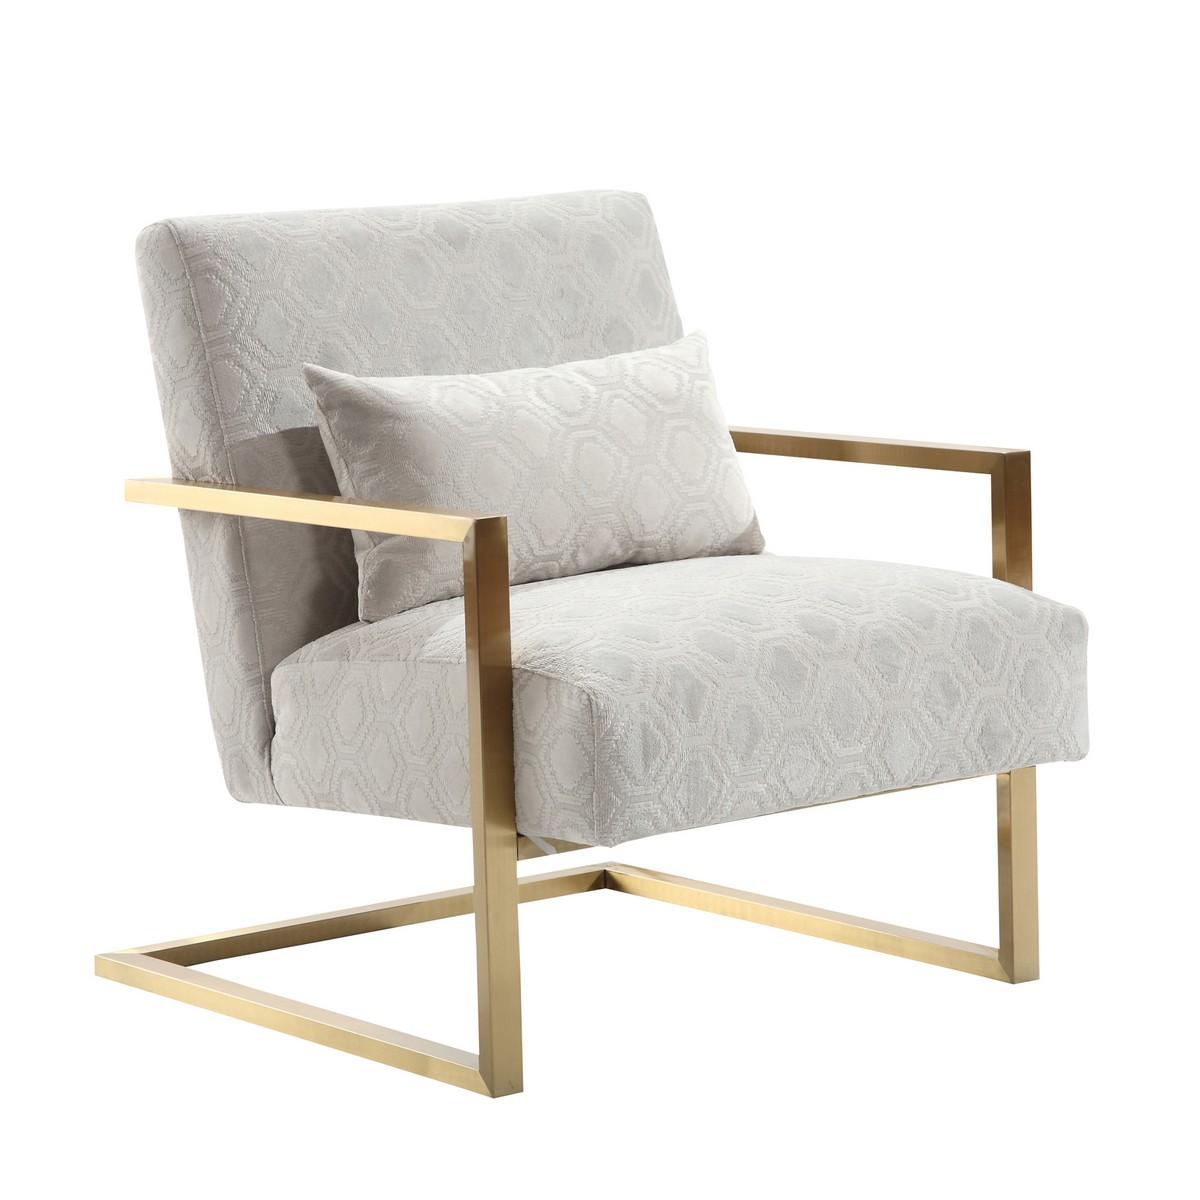 modern aluminum chair john lewis kitchen covers armen living skyline accent in cream chenille